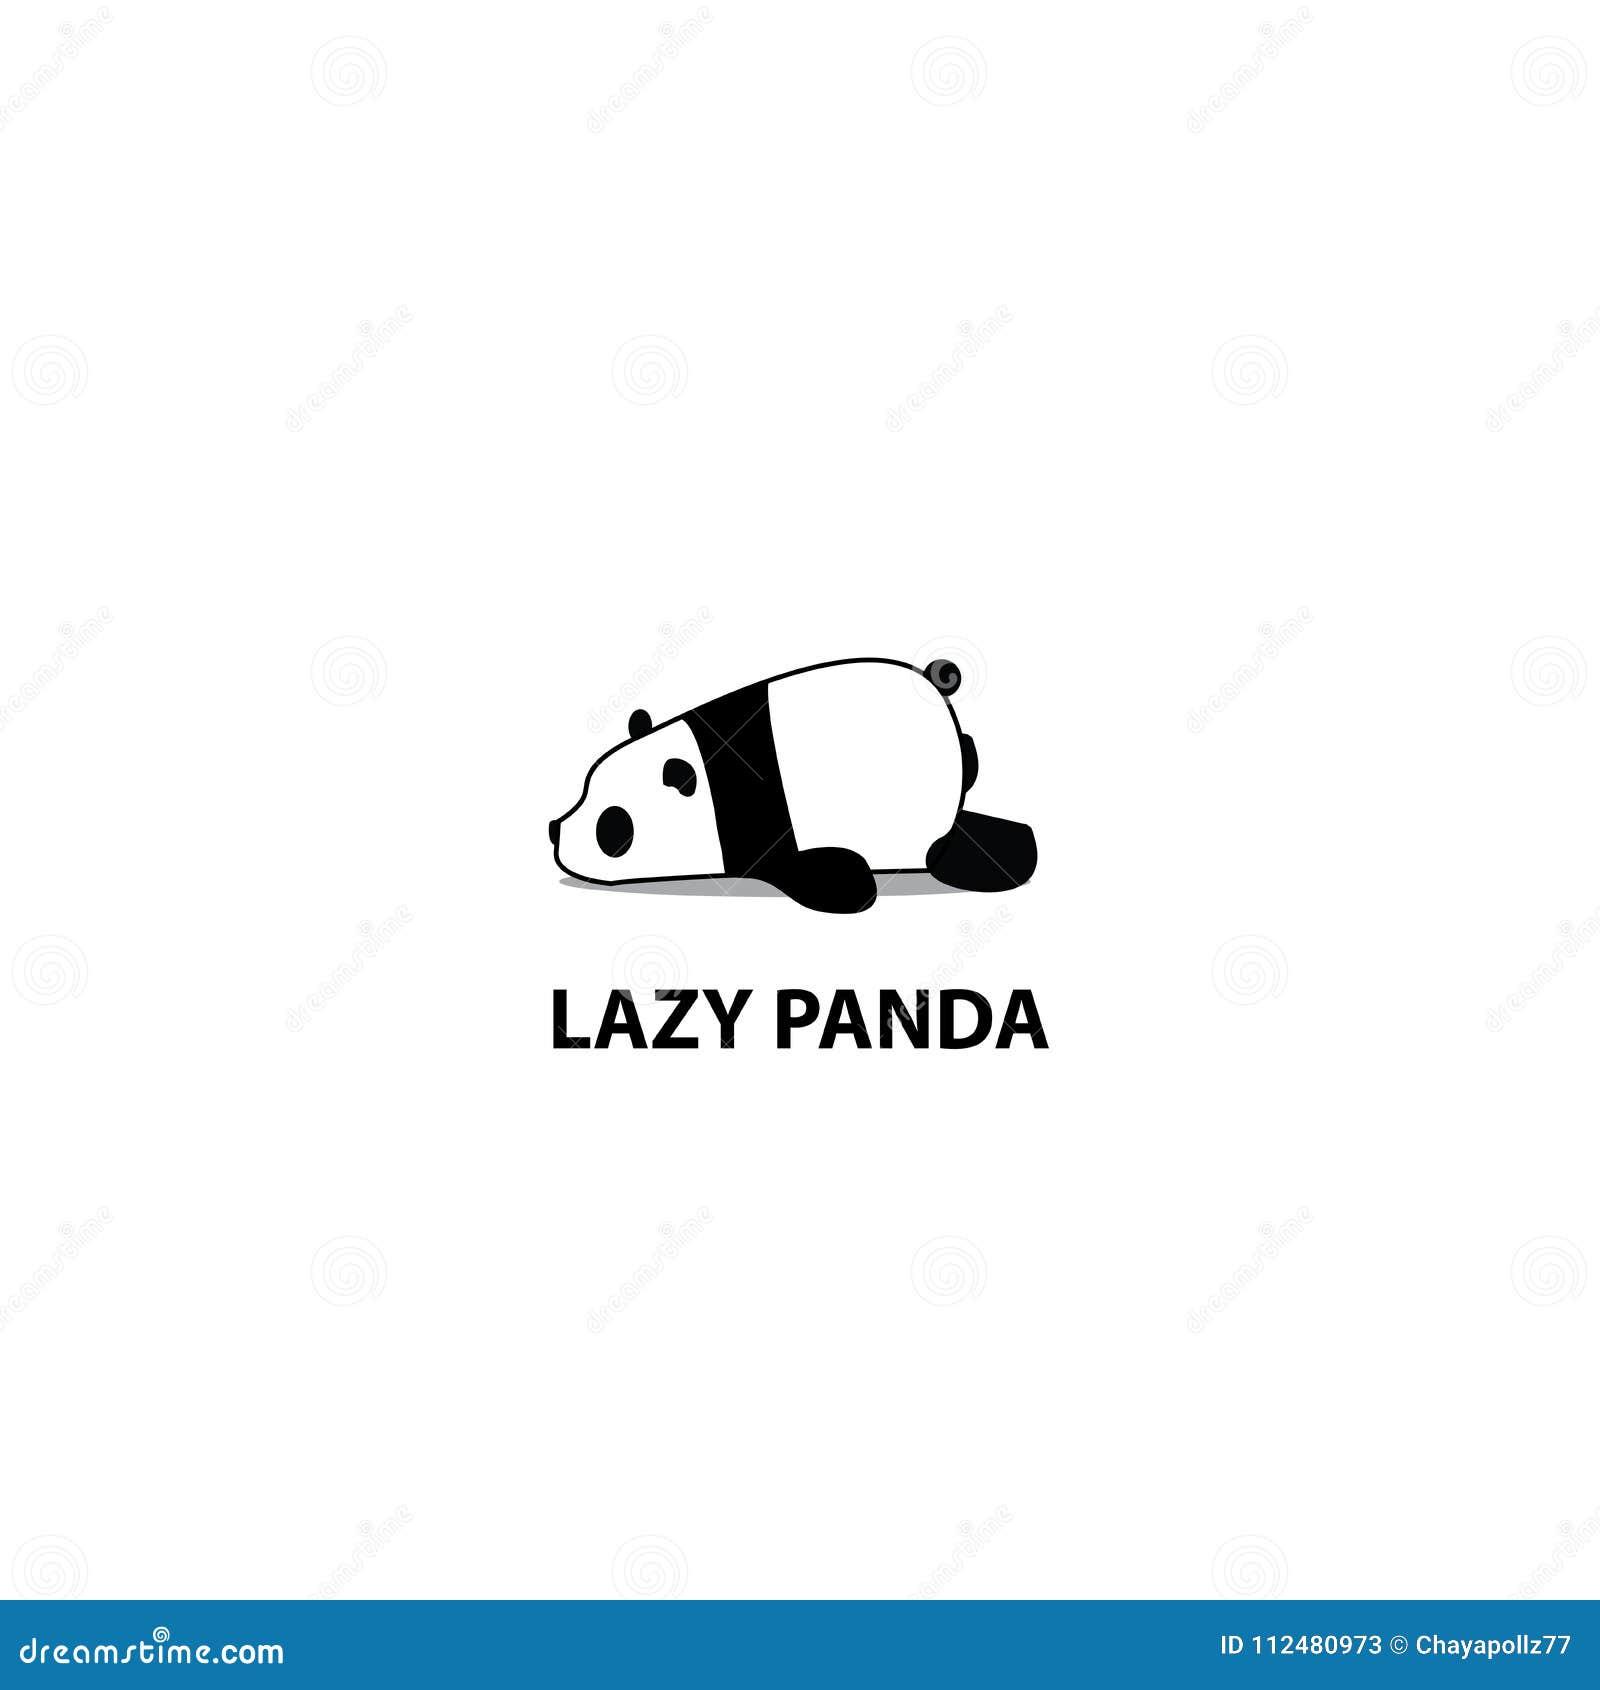 Lazy panda icon, logo design